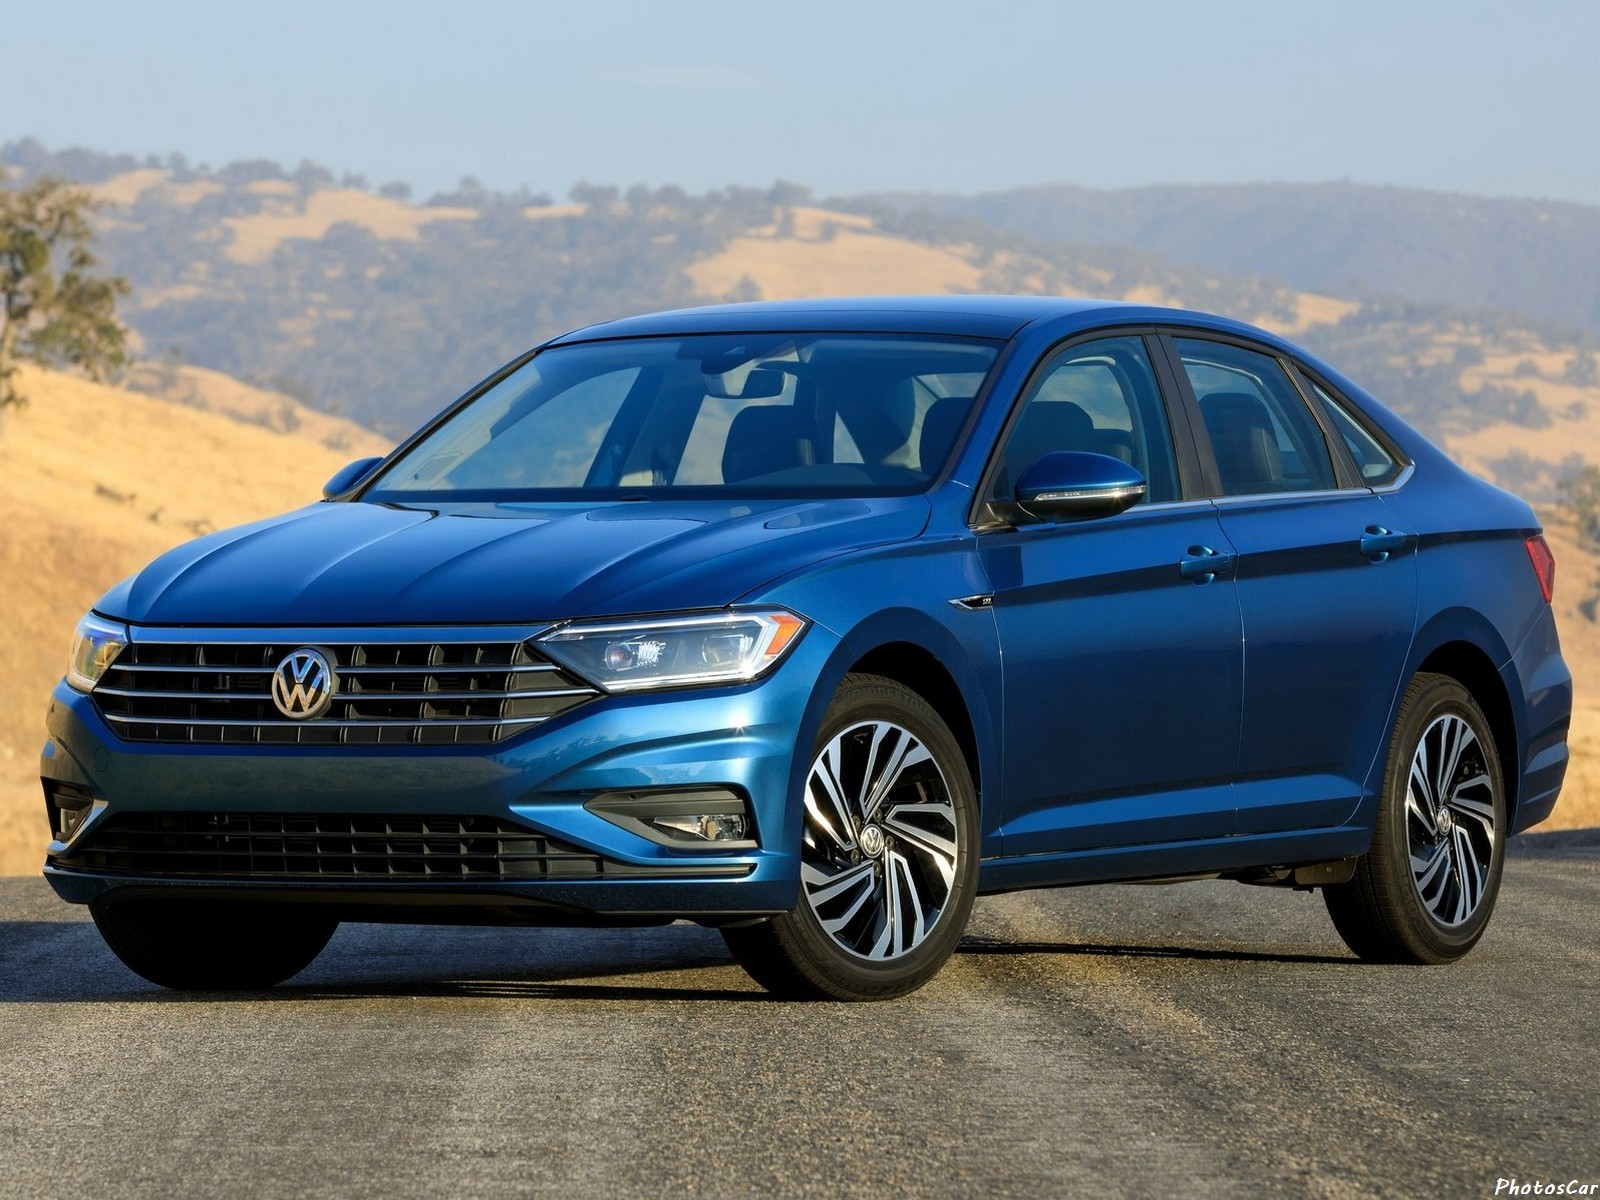 Volkswagen Jetta 2019: Elle a un design beaucoup plus attrayant